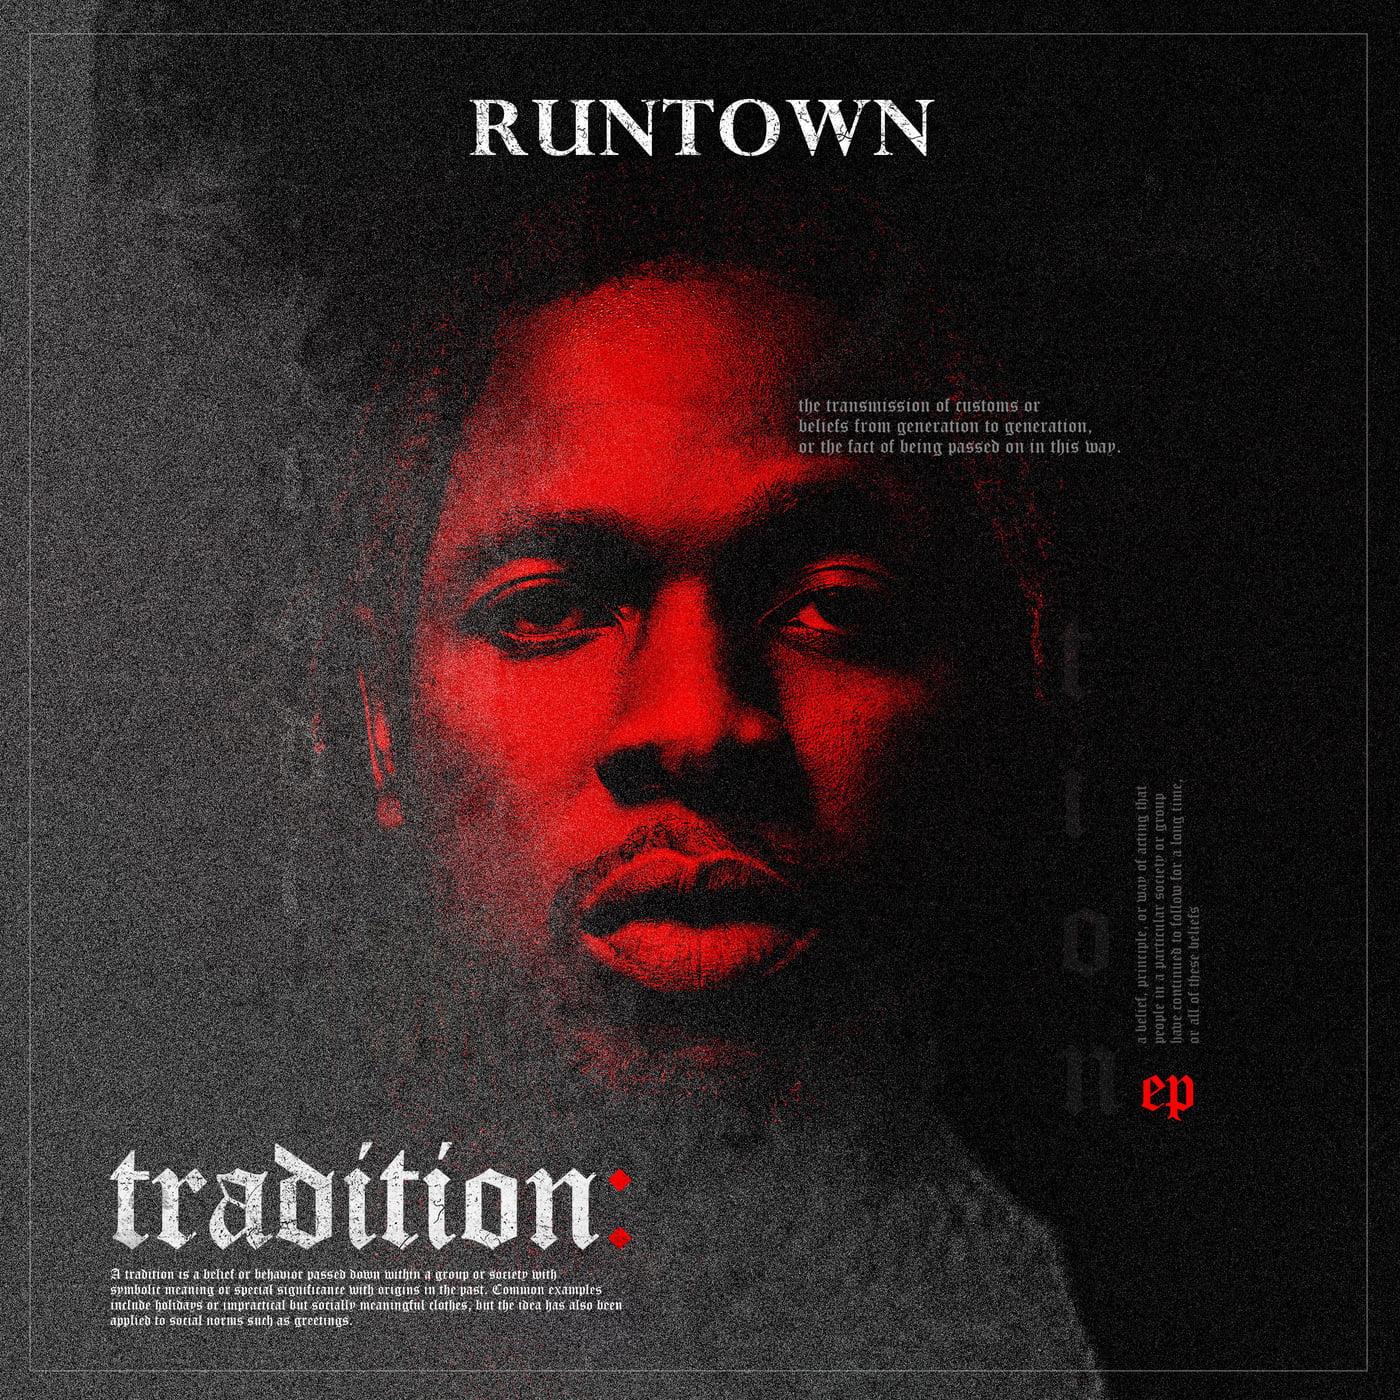 Runtown – Tradition EP (Full Album) | DCLeakers